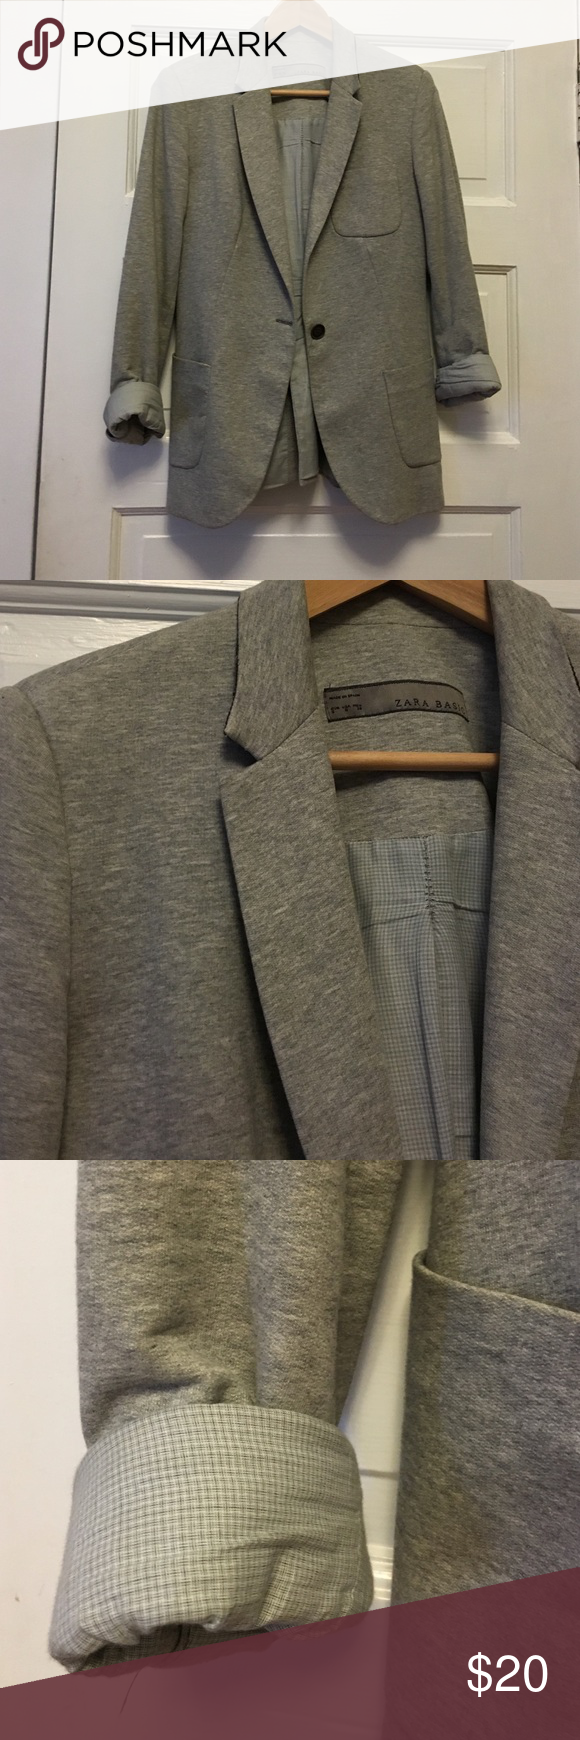 Zara basics blazer Lightly worn cotton blazer with lining. Perfect casual and cool blazer for a polished professional look Zara Jackets & Coats Blazers